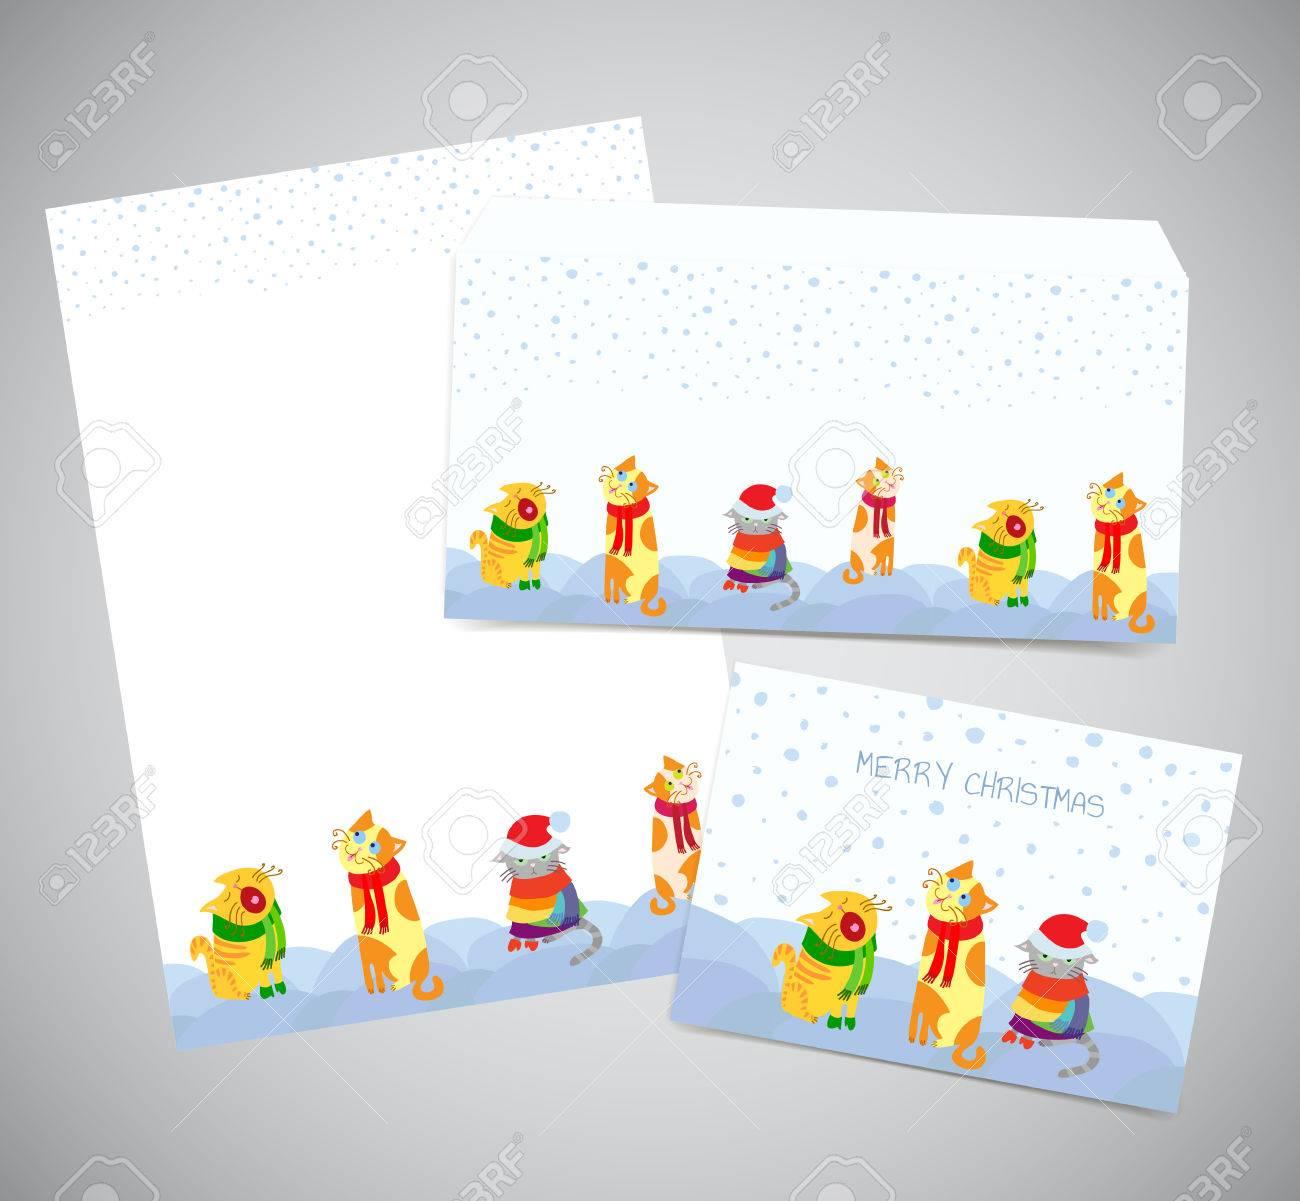 corporate identity or postal set christmas design print corporate identity or postal set christmas design print templates of letter paper page